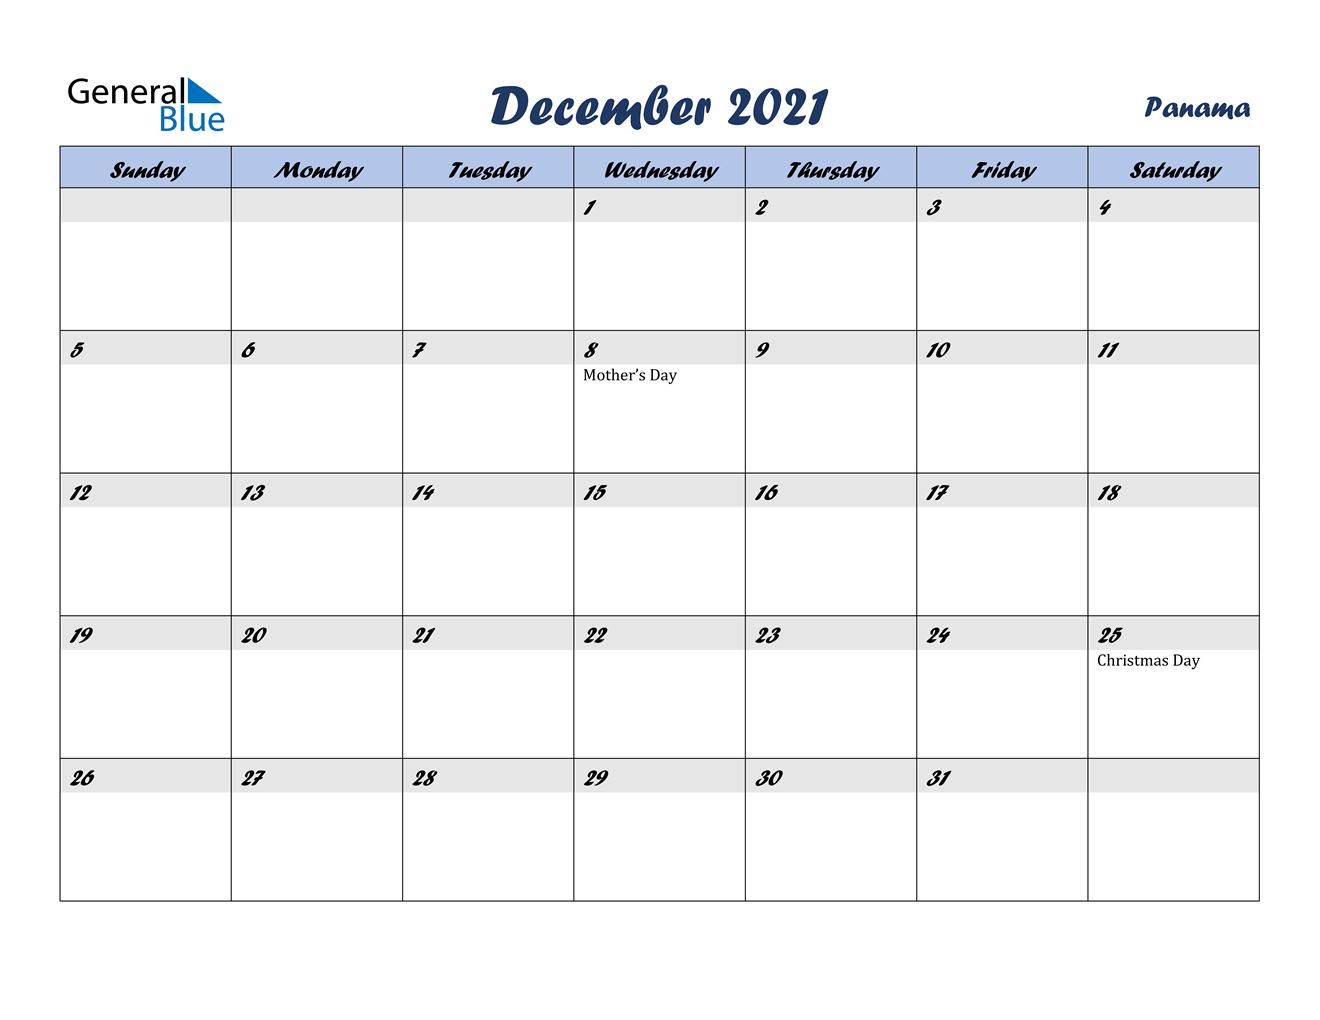 December 2021 Calendar - Panama